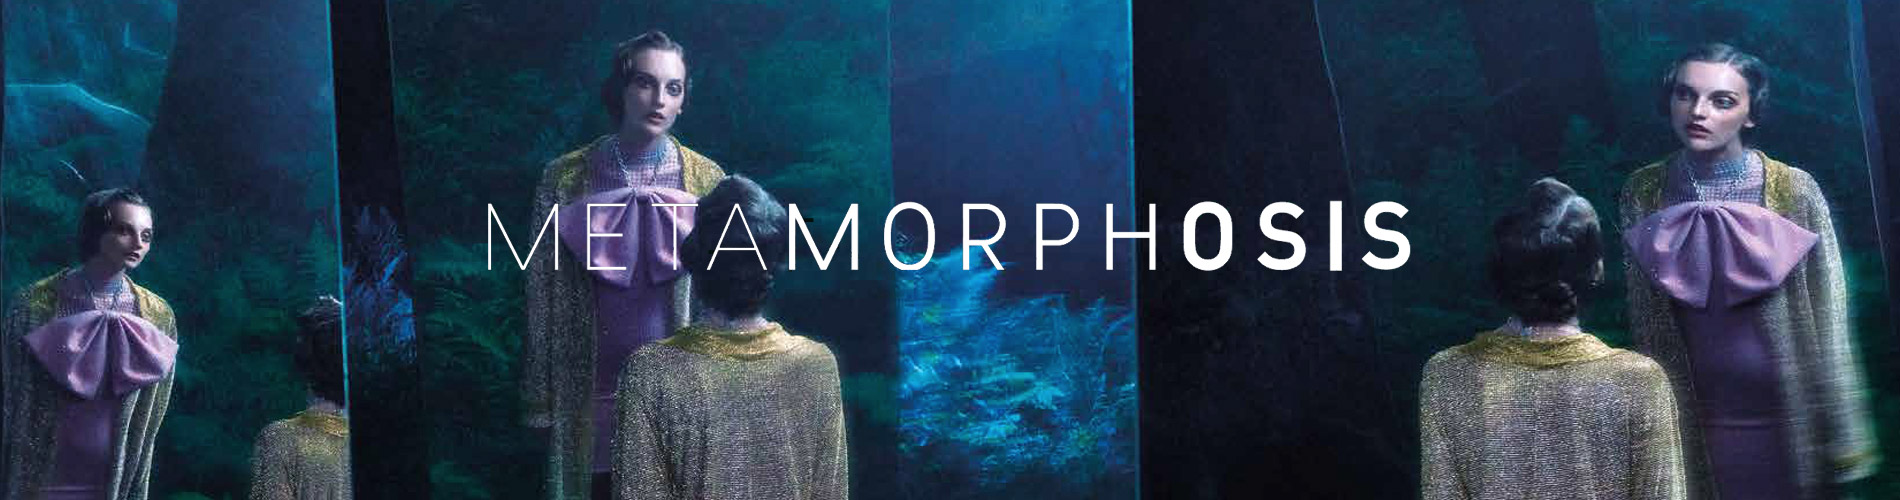 Preciosa Metamorphosis FW 2020/21